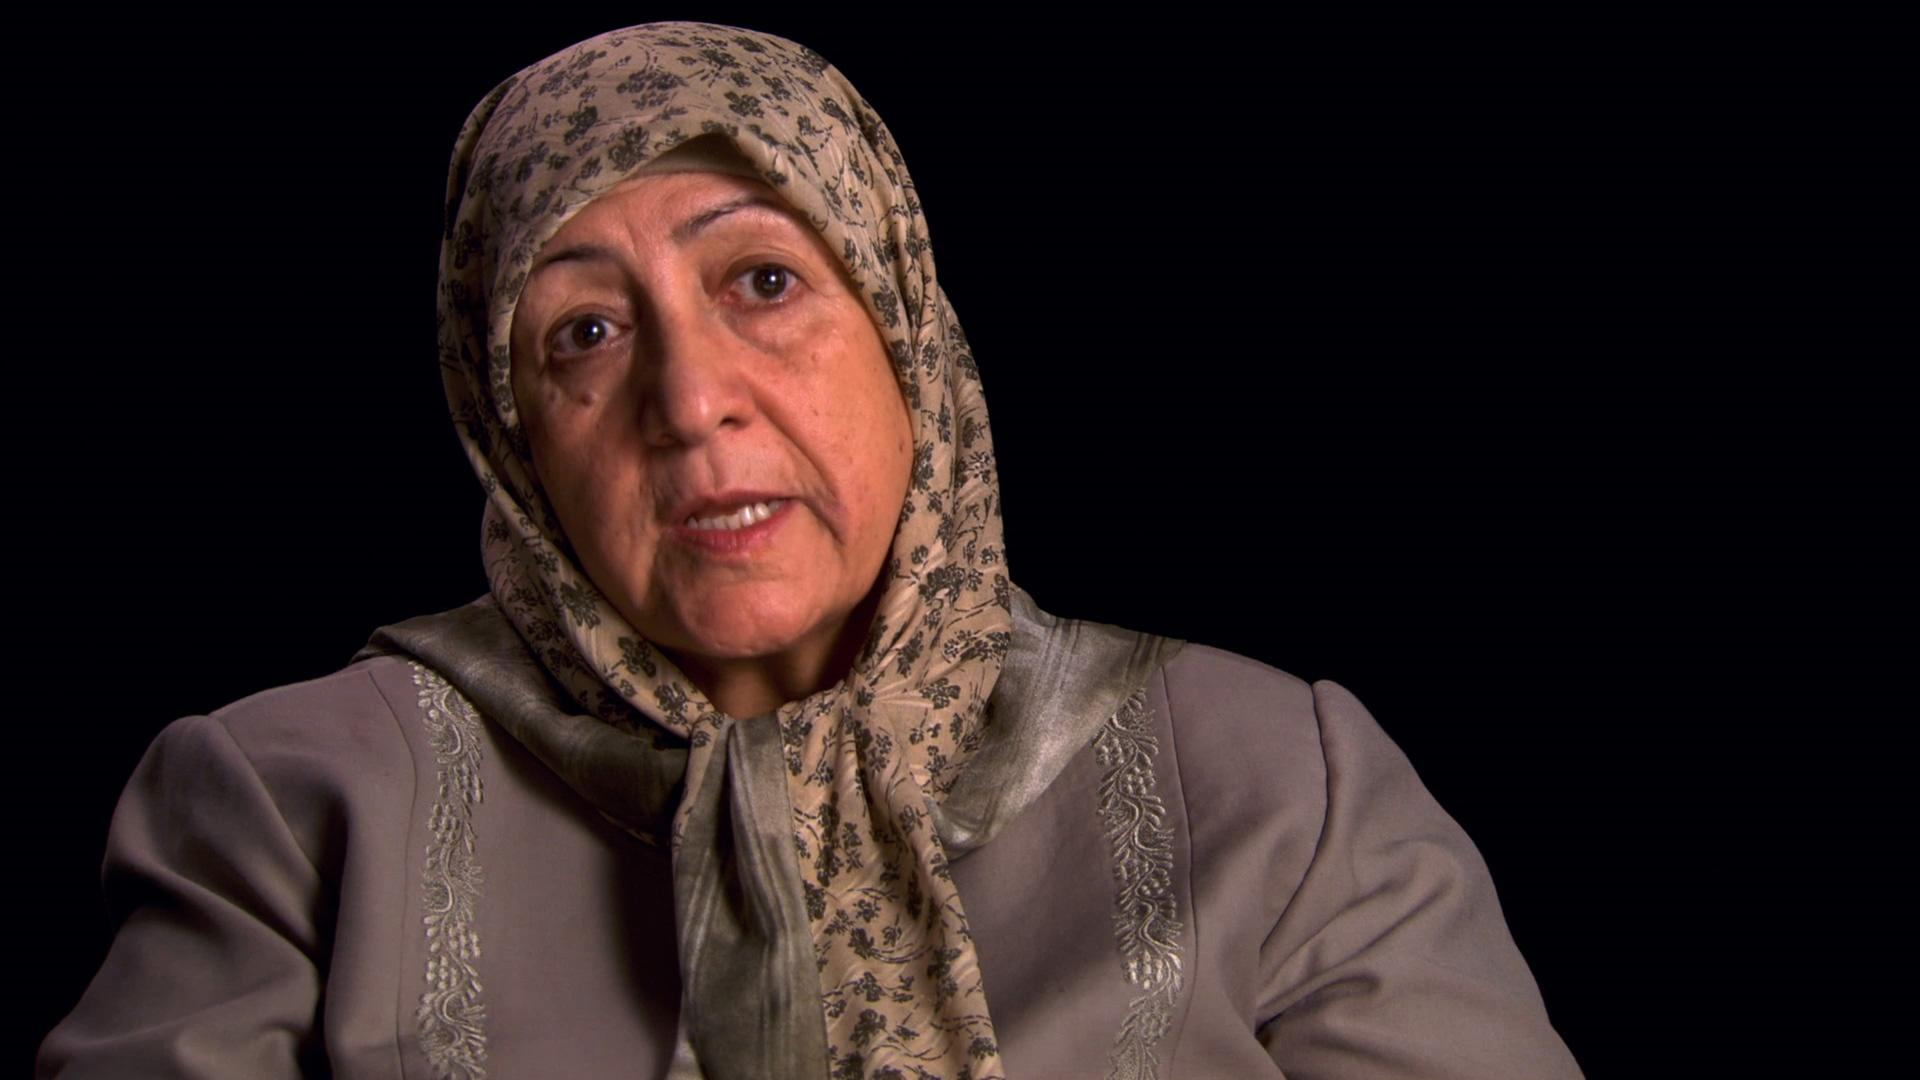 Sakena Yacoobi on Educating Women and Girls in Afghanistan image